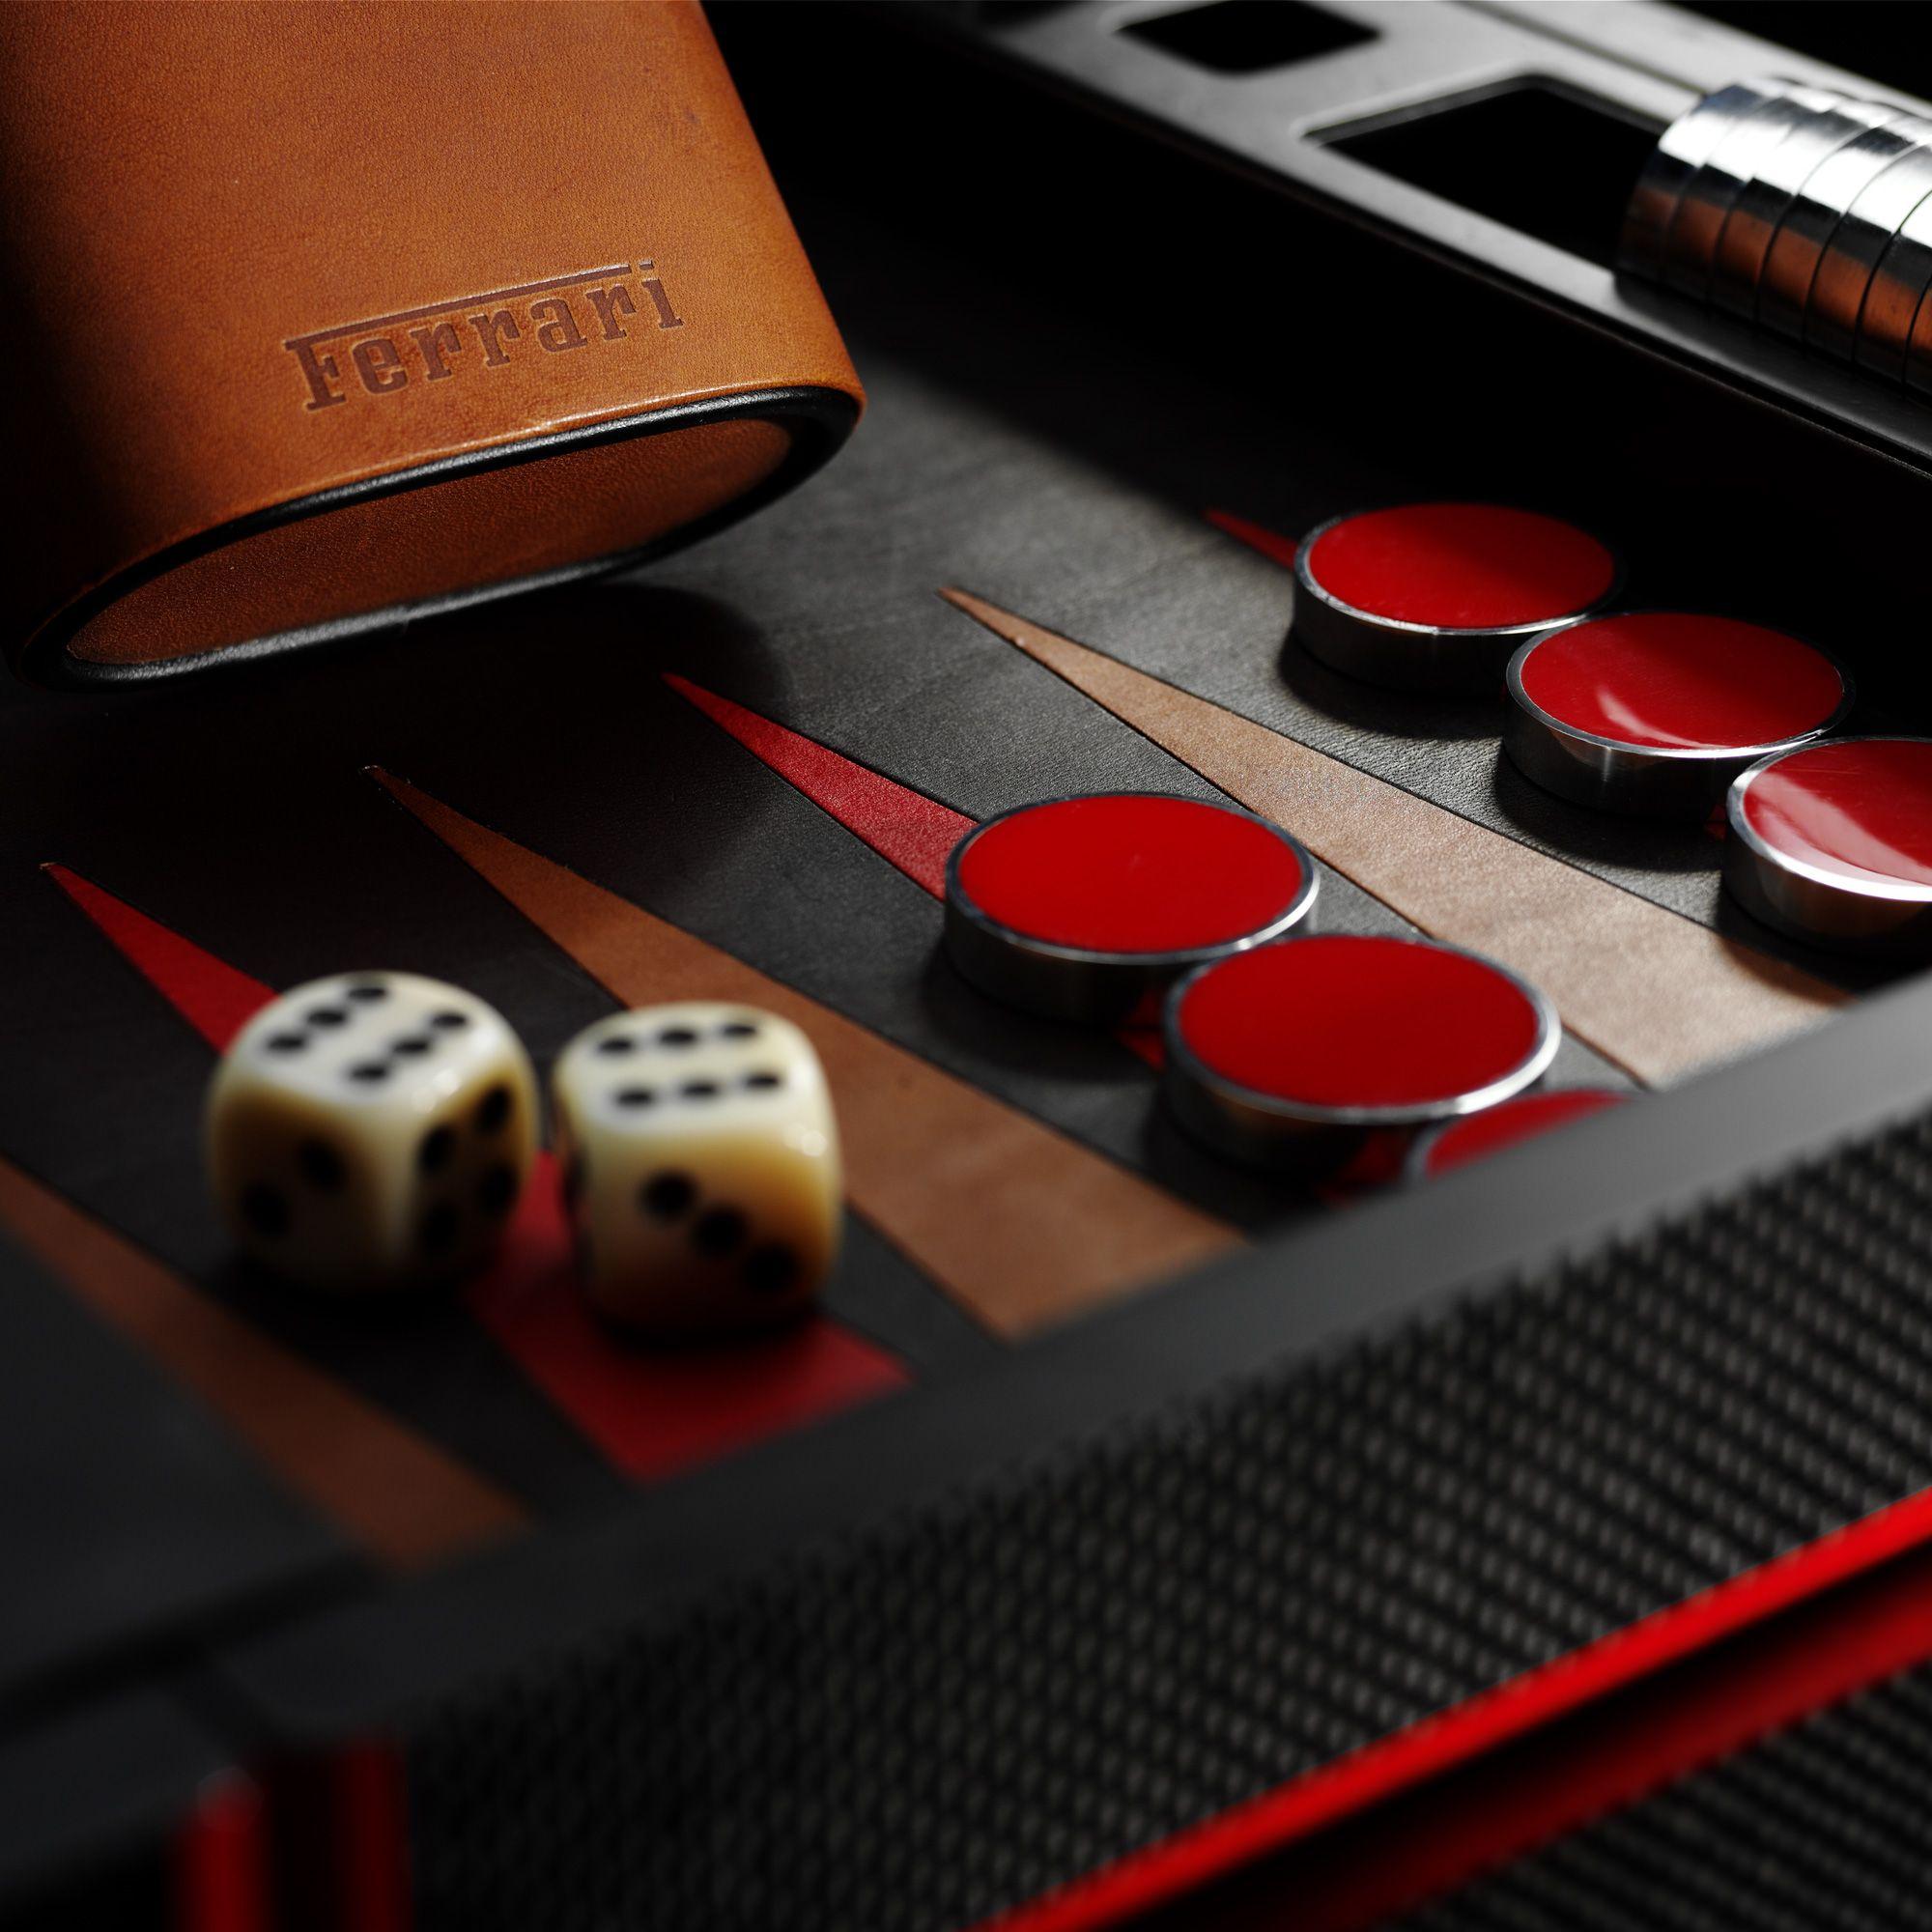 Carbon fibre backgammon set Ferrari. Would Ed play with